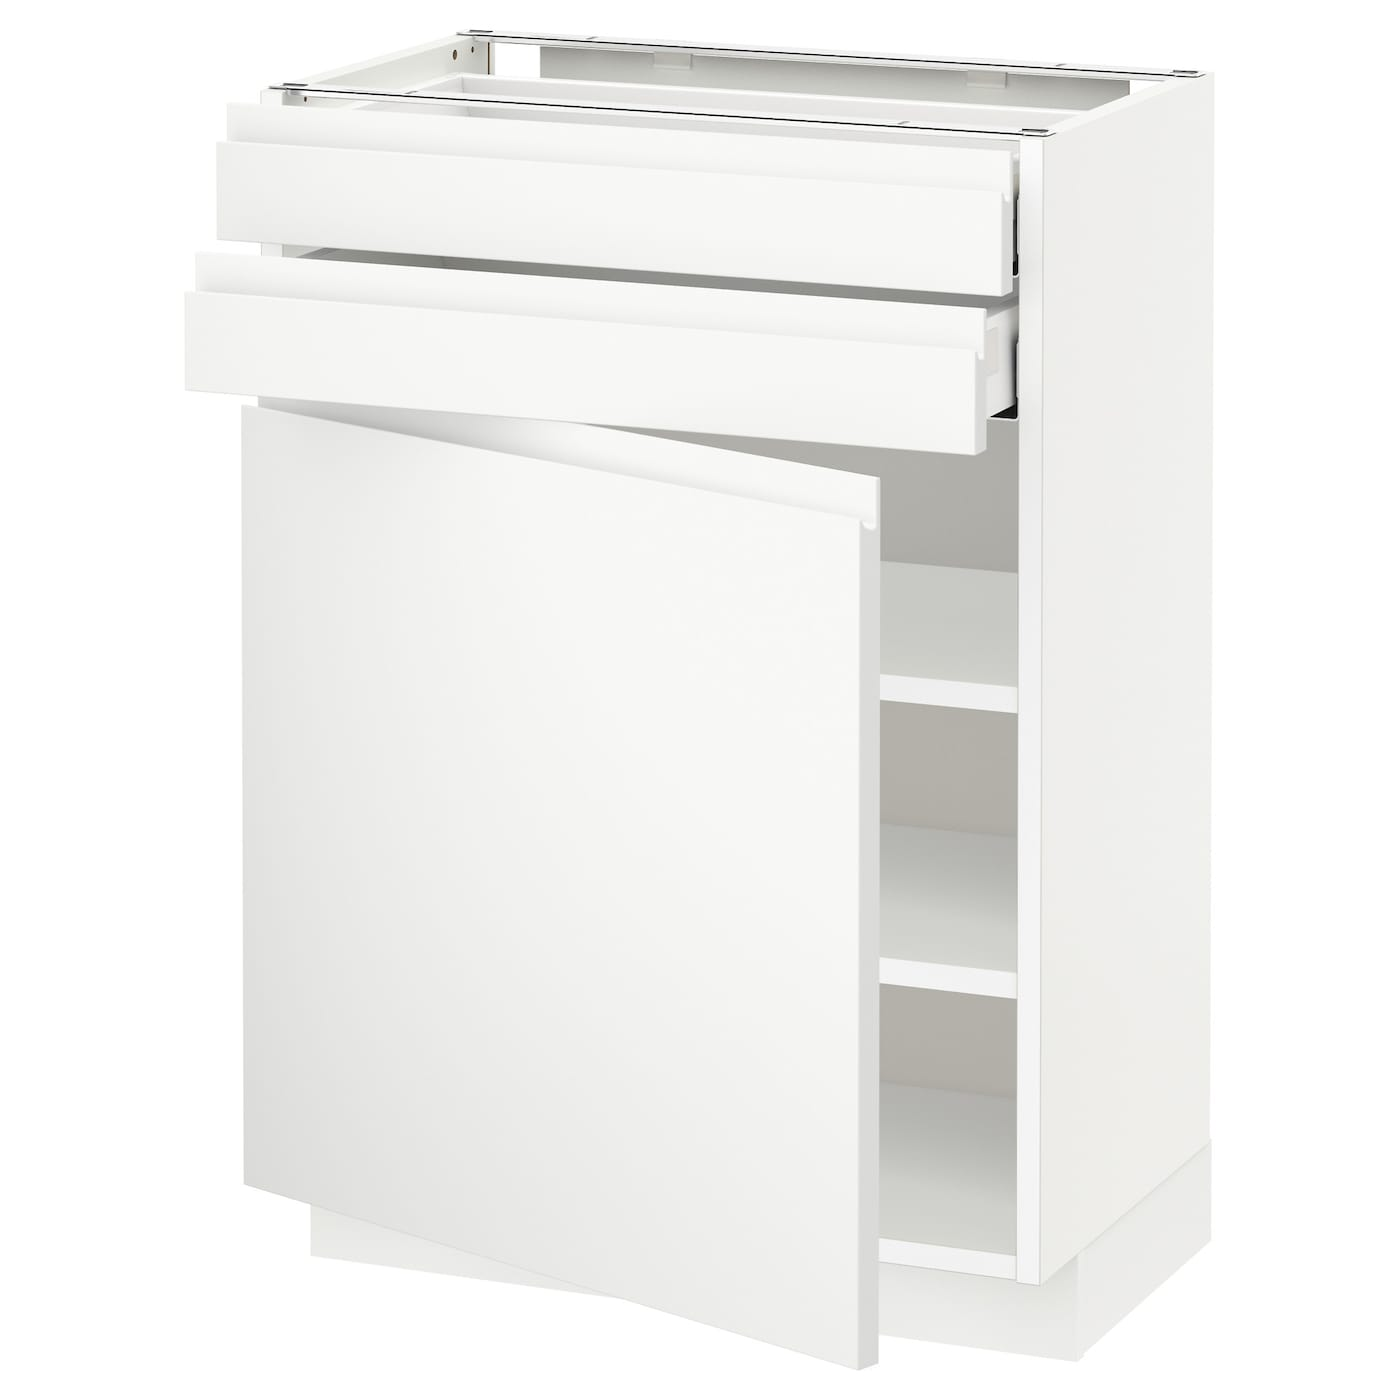 metod maximera base cabinet w door 2 drawers white voxtorp white 60x37 cm ikea. Black Bedroom Furniture Sets. Home Design Ideas